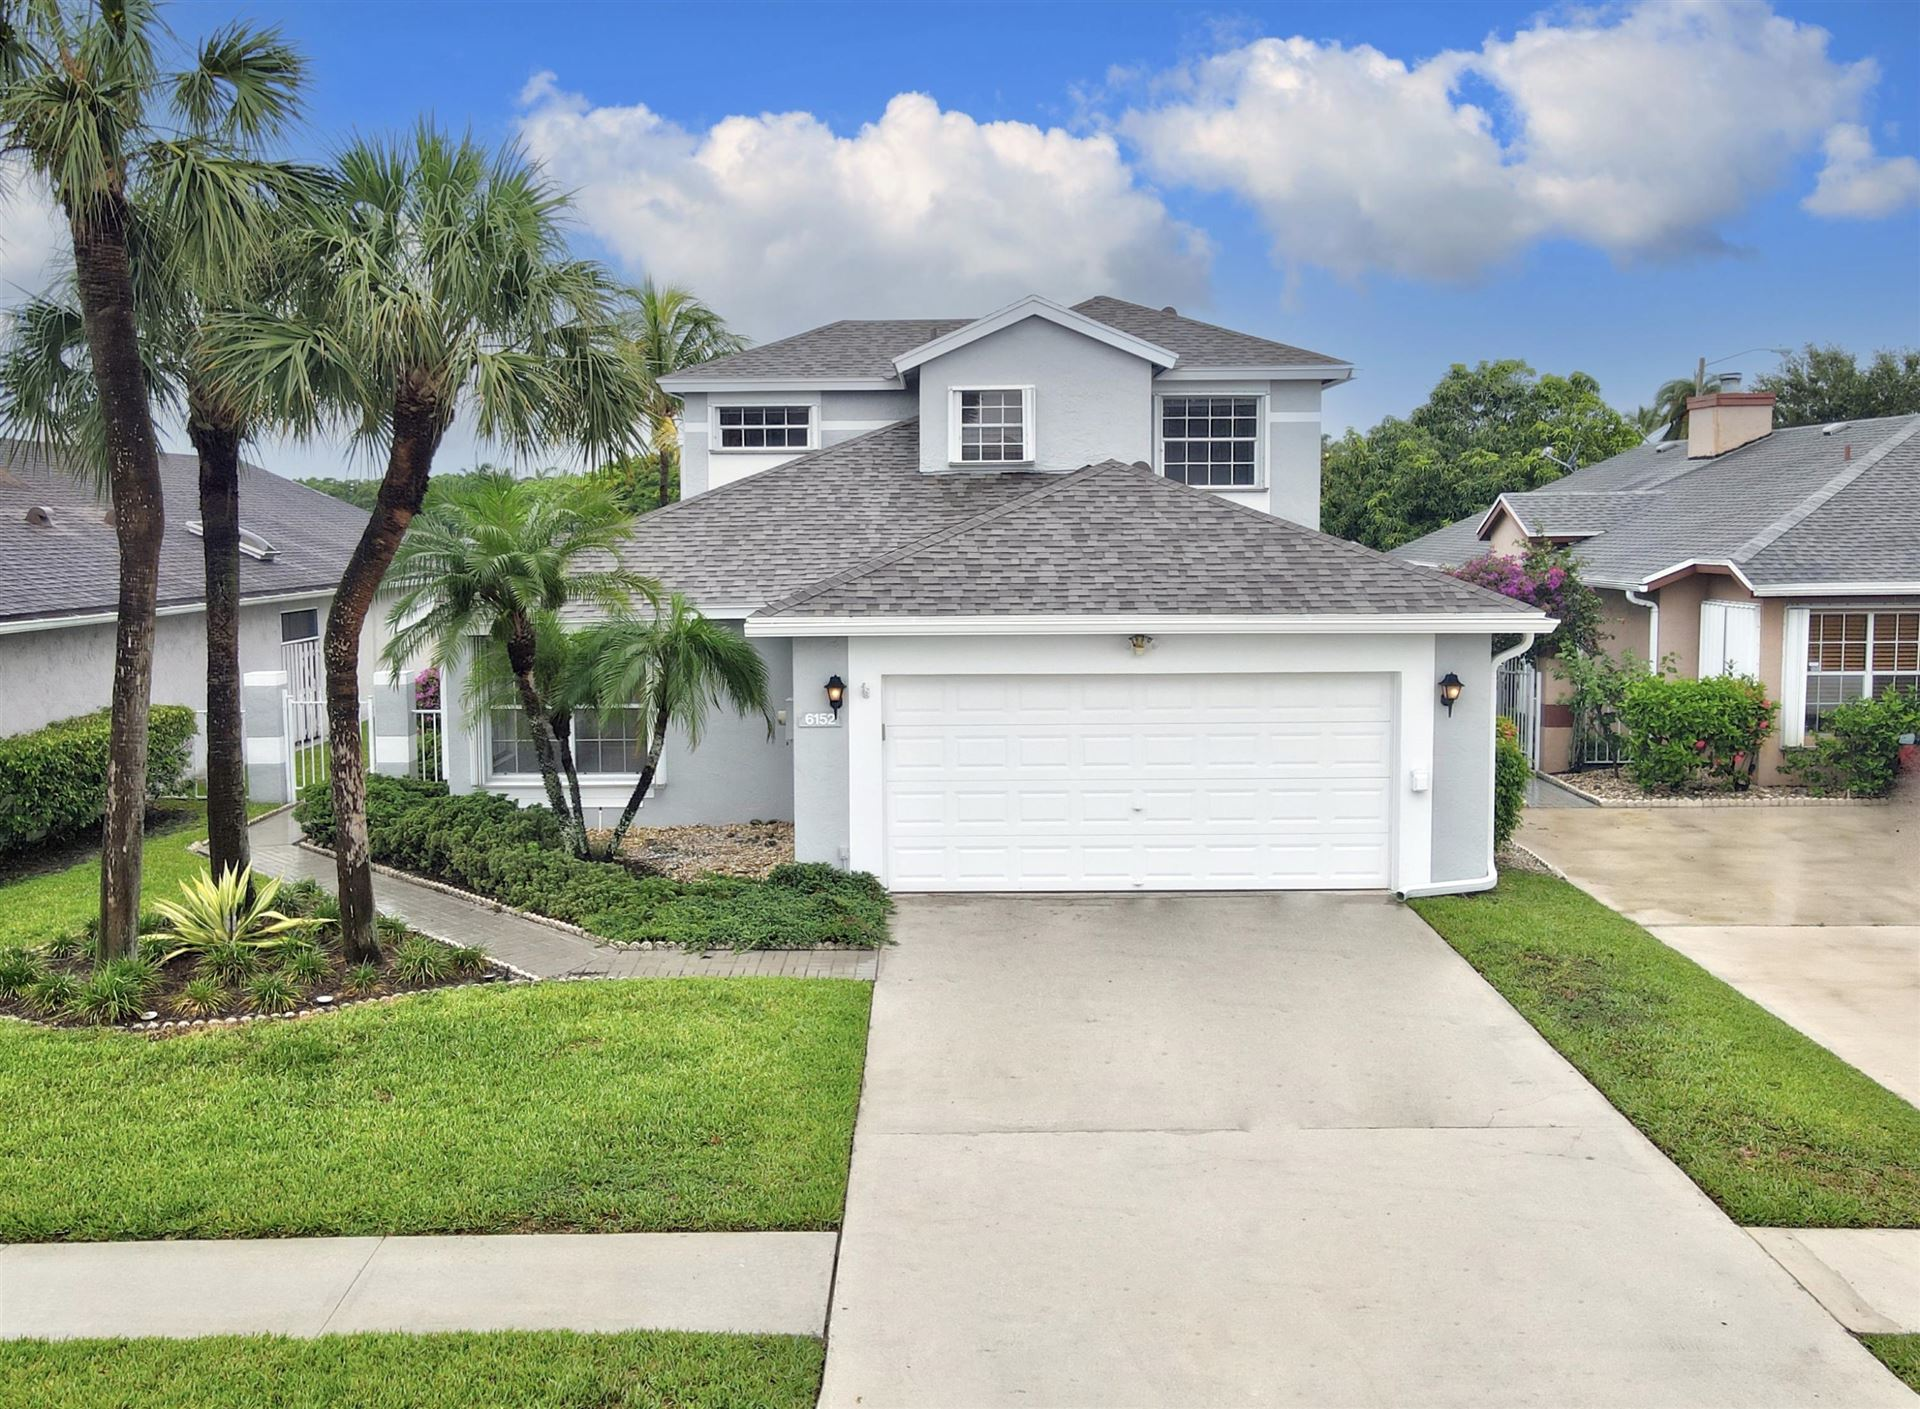 6152 Lansdowne Circle, Boynton Beach, FL 33472 - MLS#: RX-10725725